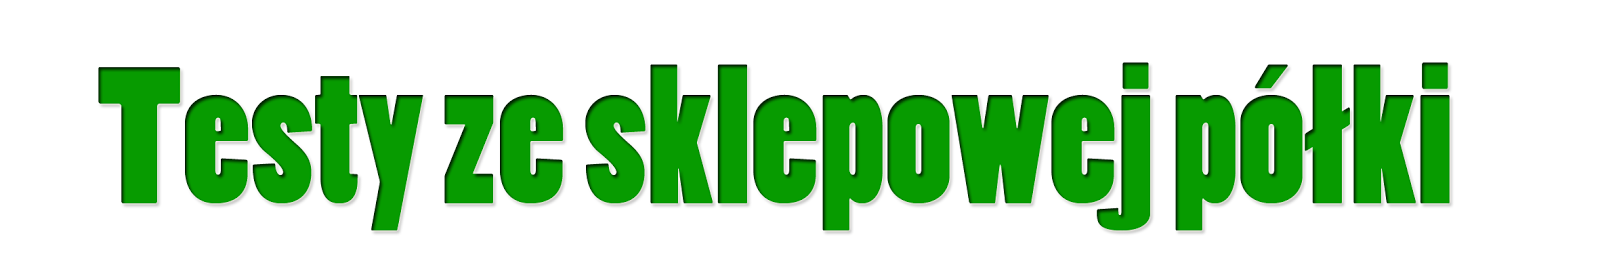 http://myszkagotuje.blogspot.com/search/label/recenzje%20spo%C5%BCywcze?max-results=10